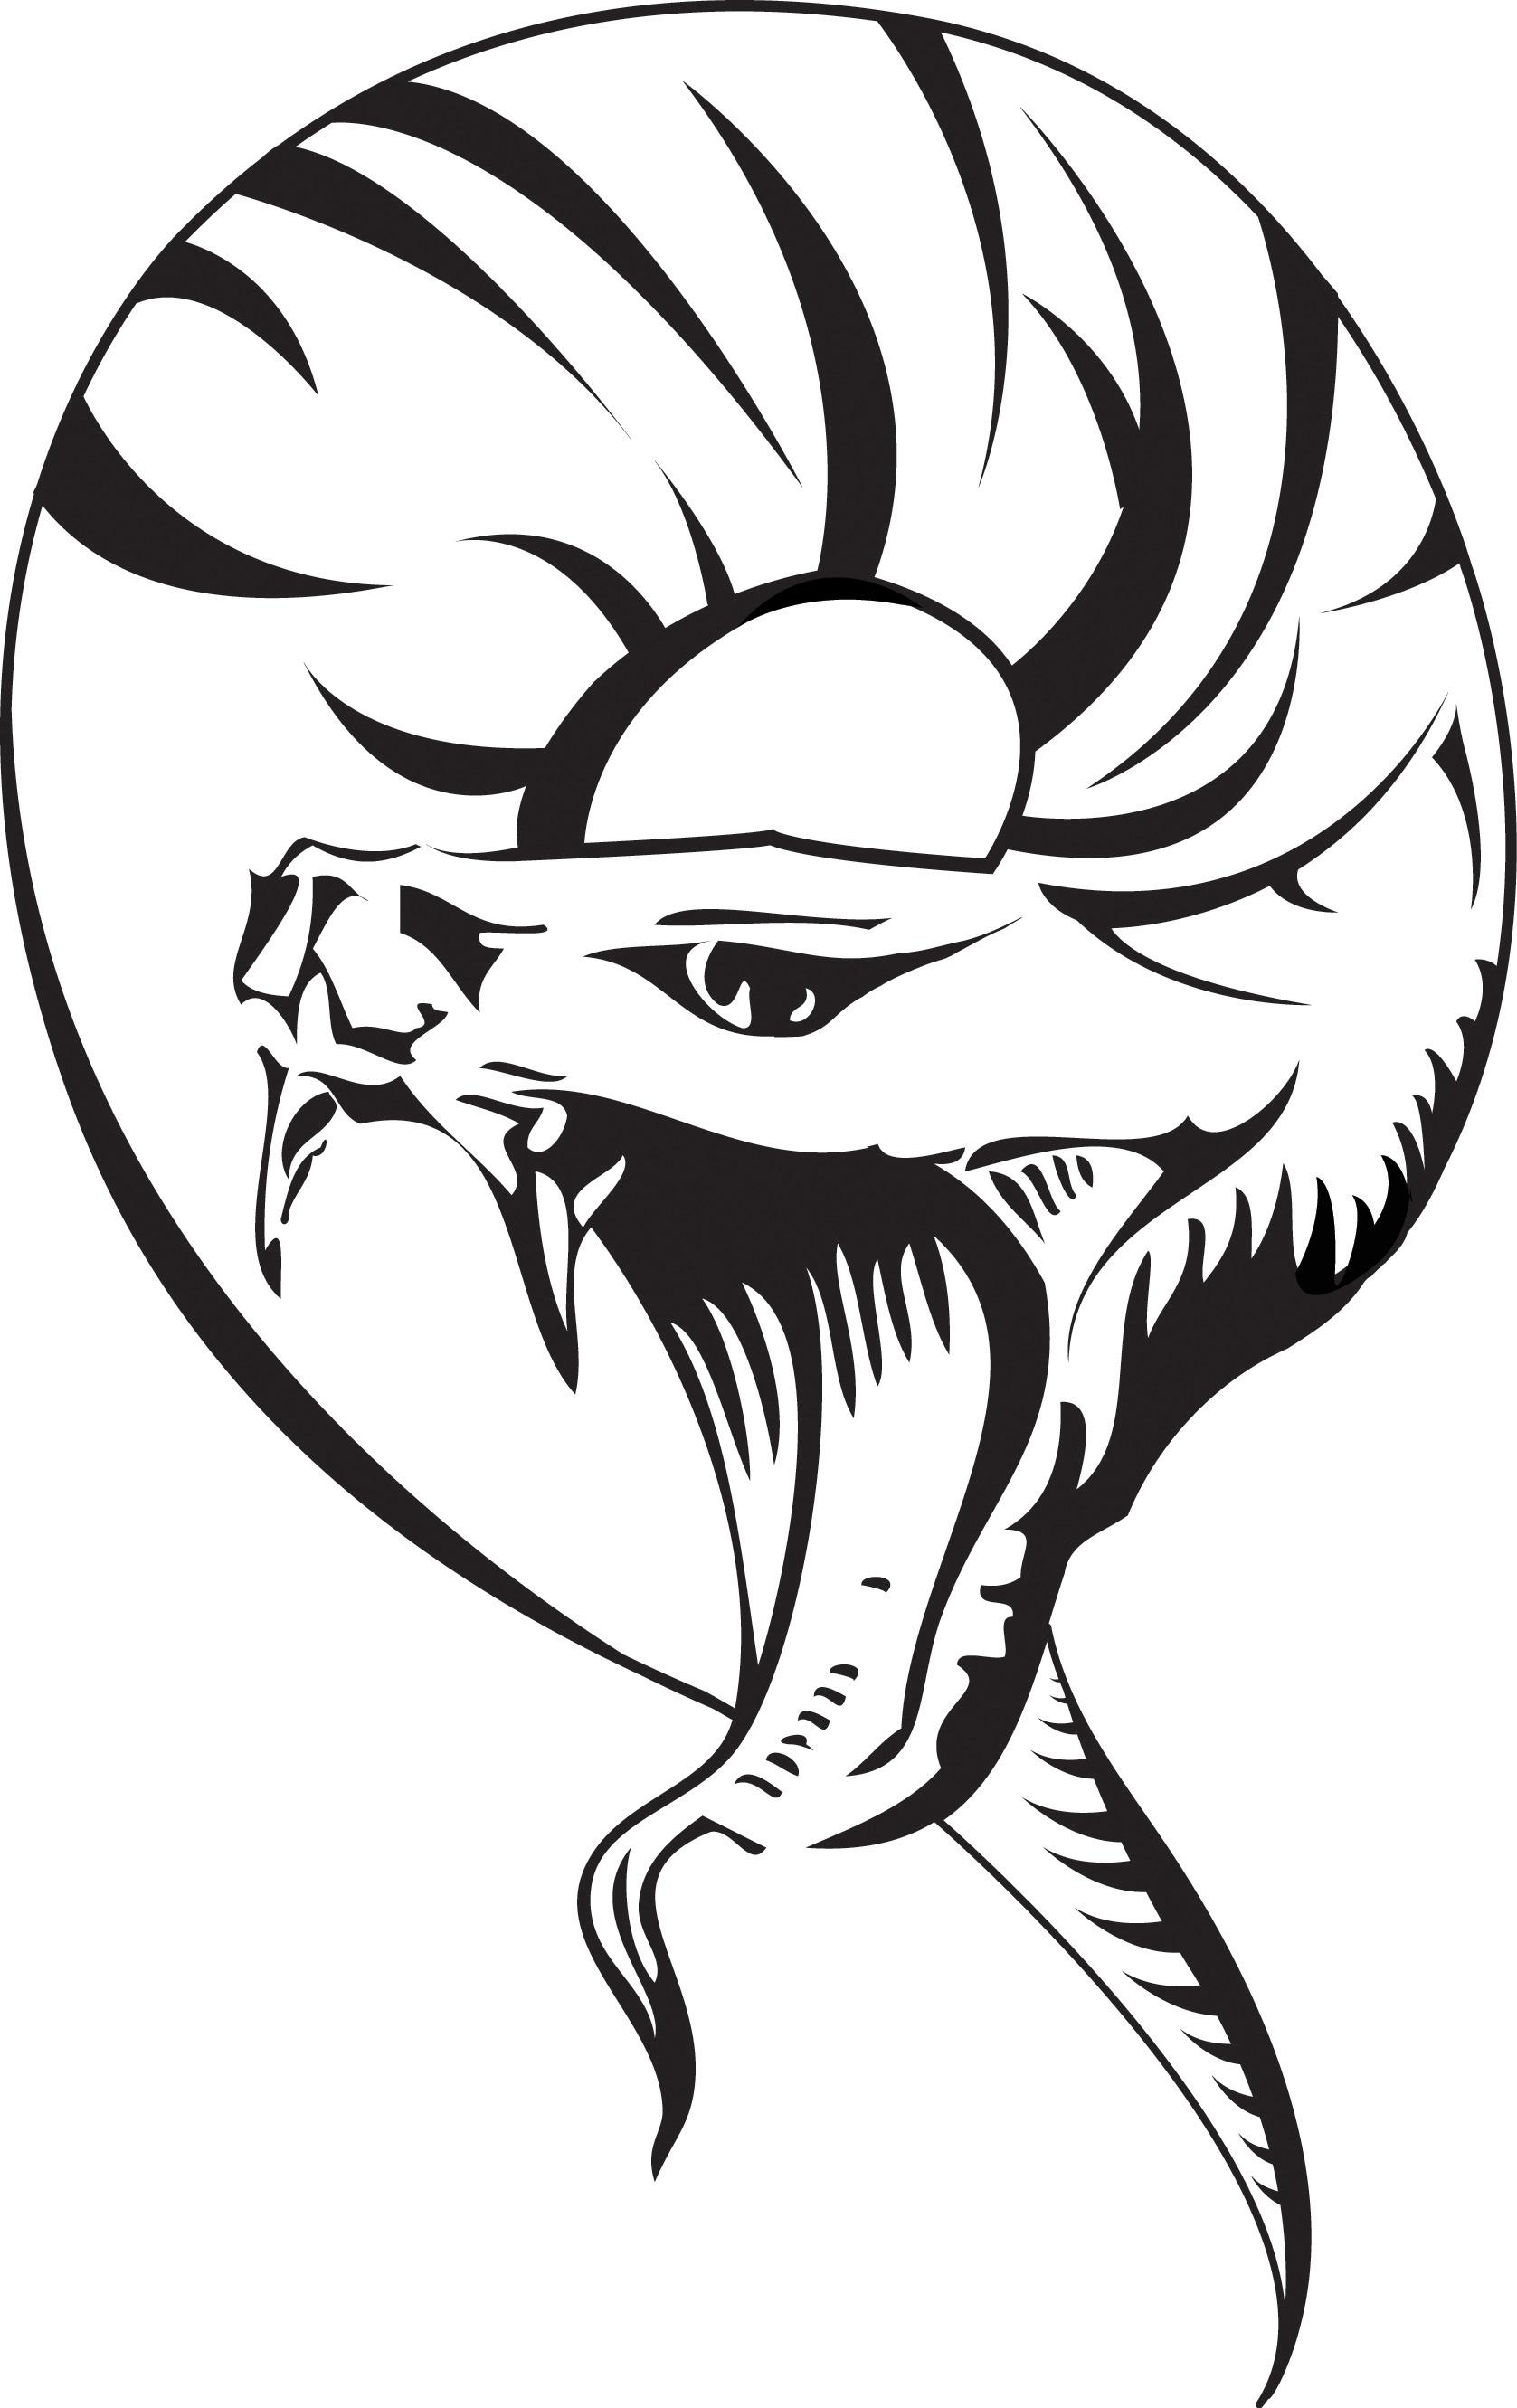 Free Download Free Tattoo Stencils, Download Free Clip Art, Free - Free Printable Tattoo Designs